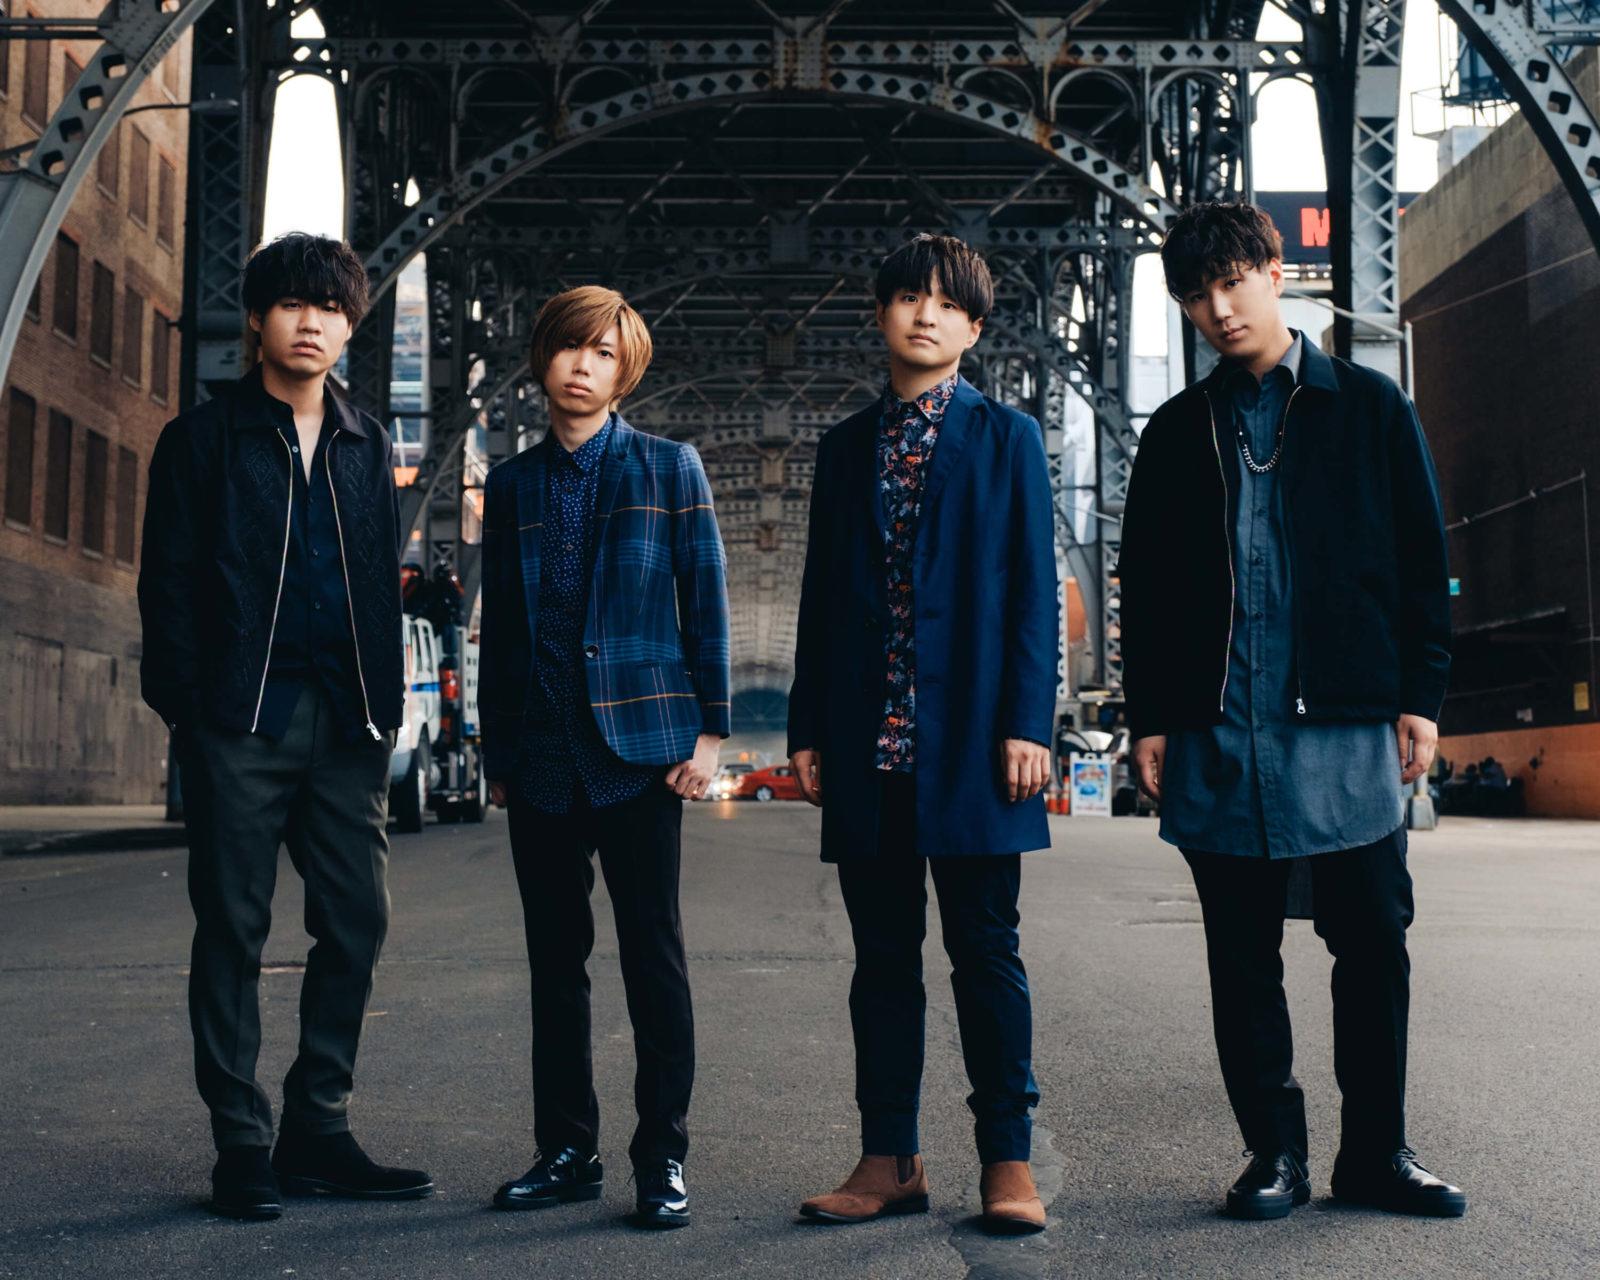 "Official髭男dism、映画『HELLO WORLD』主題歌が歌詞""注目度ランキング""1位に輝くサムネイル画像!"